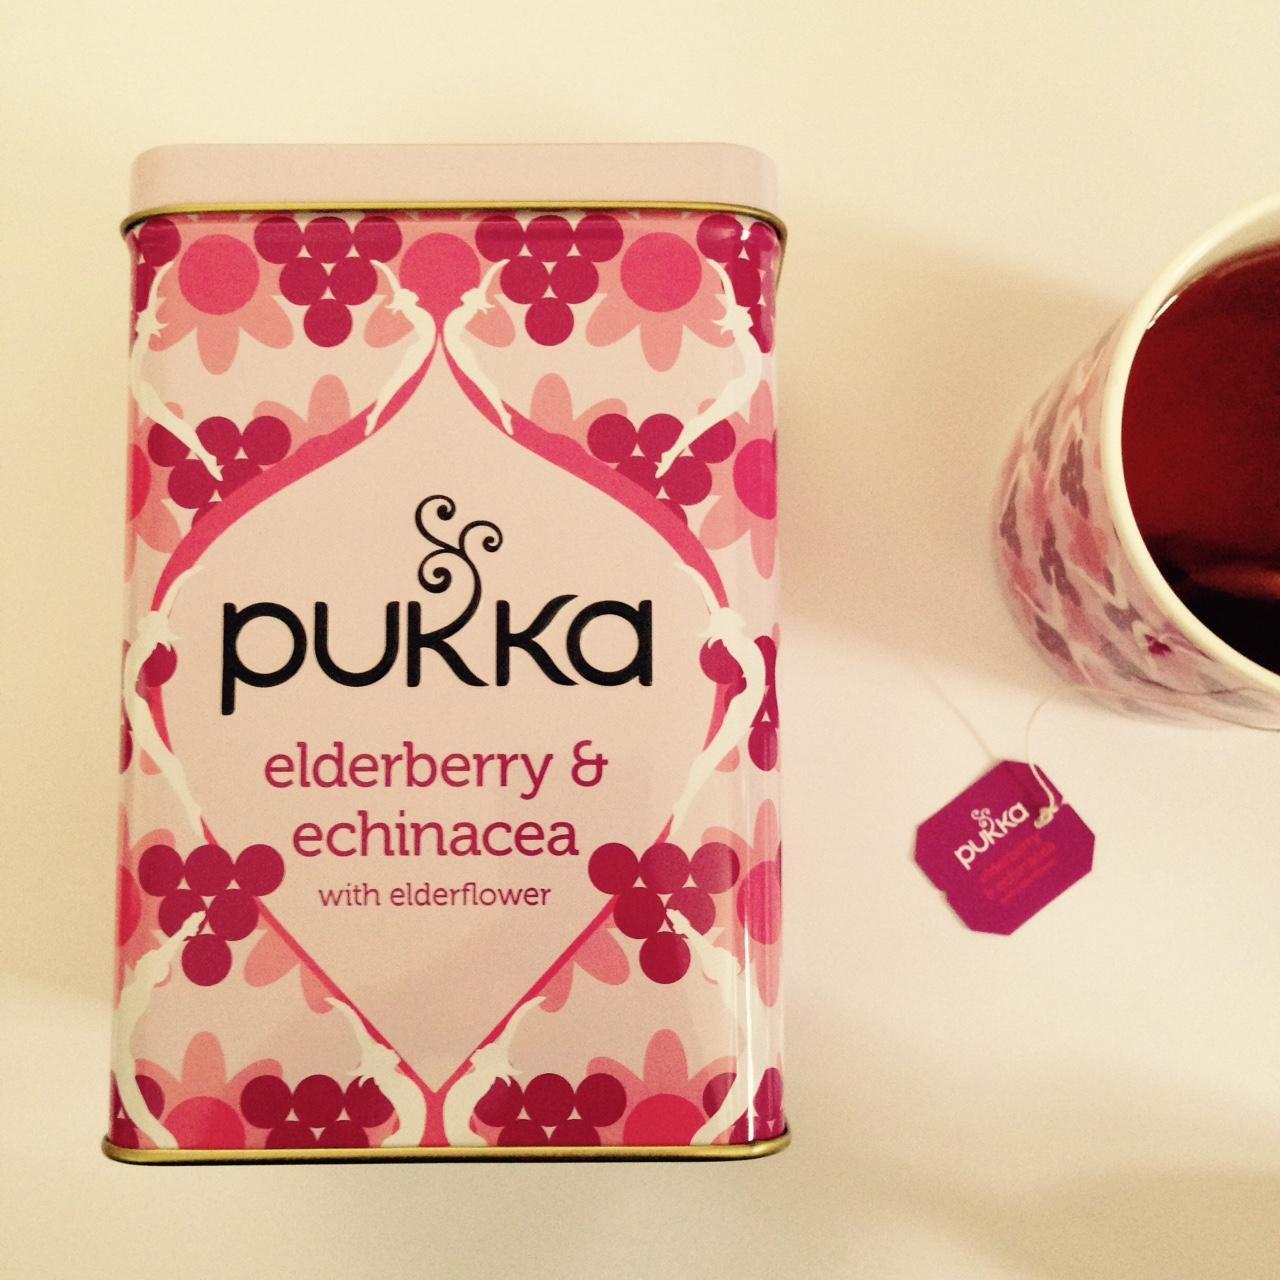 elderberry and echinacea tea